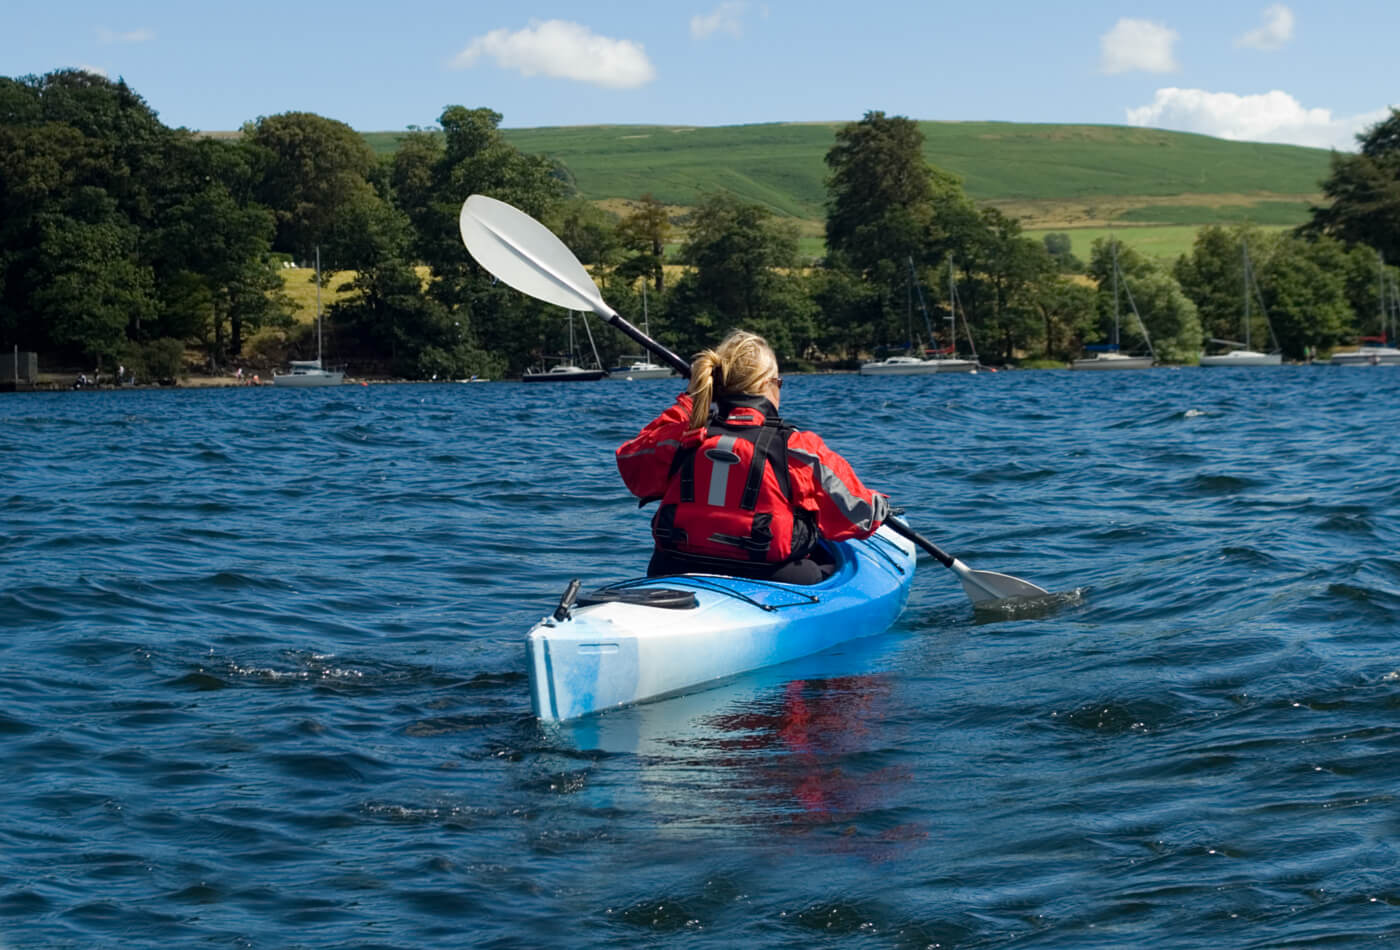 Top 5 Outdoor Activities In The Lakes Outdoor Guide